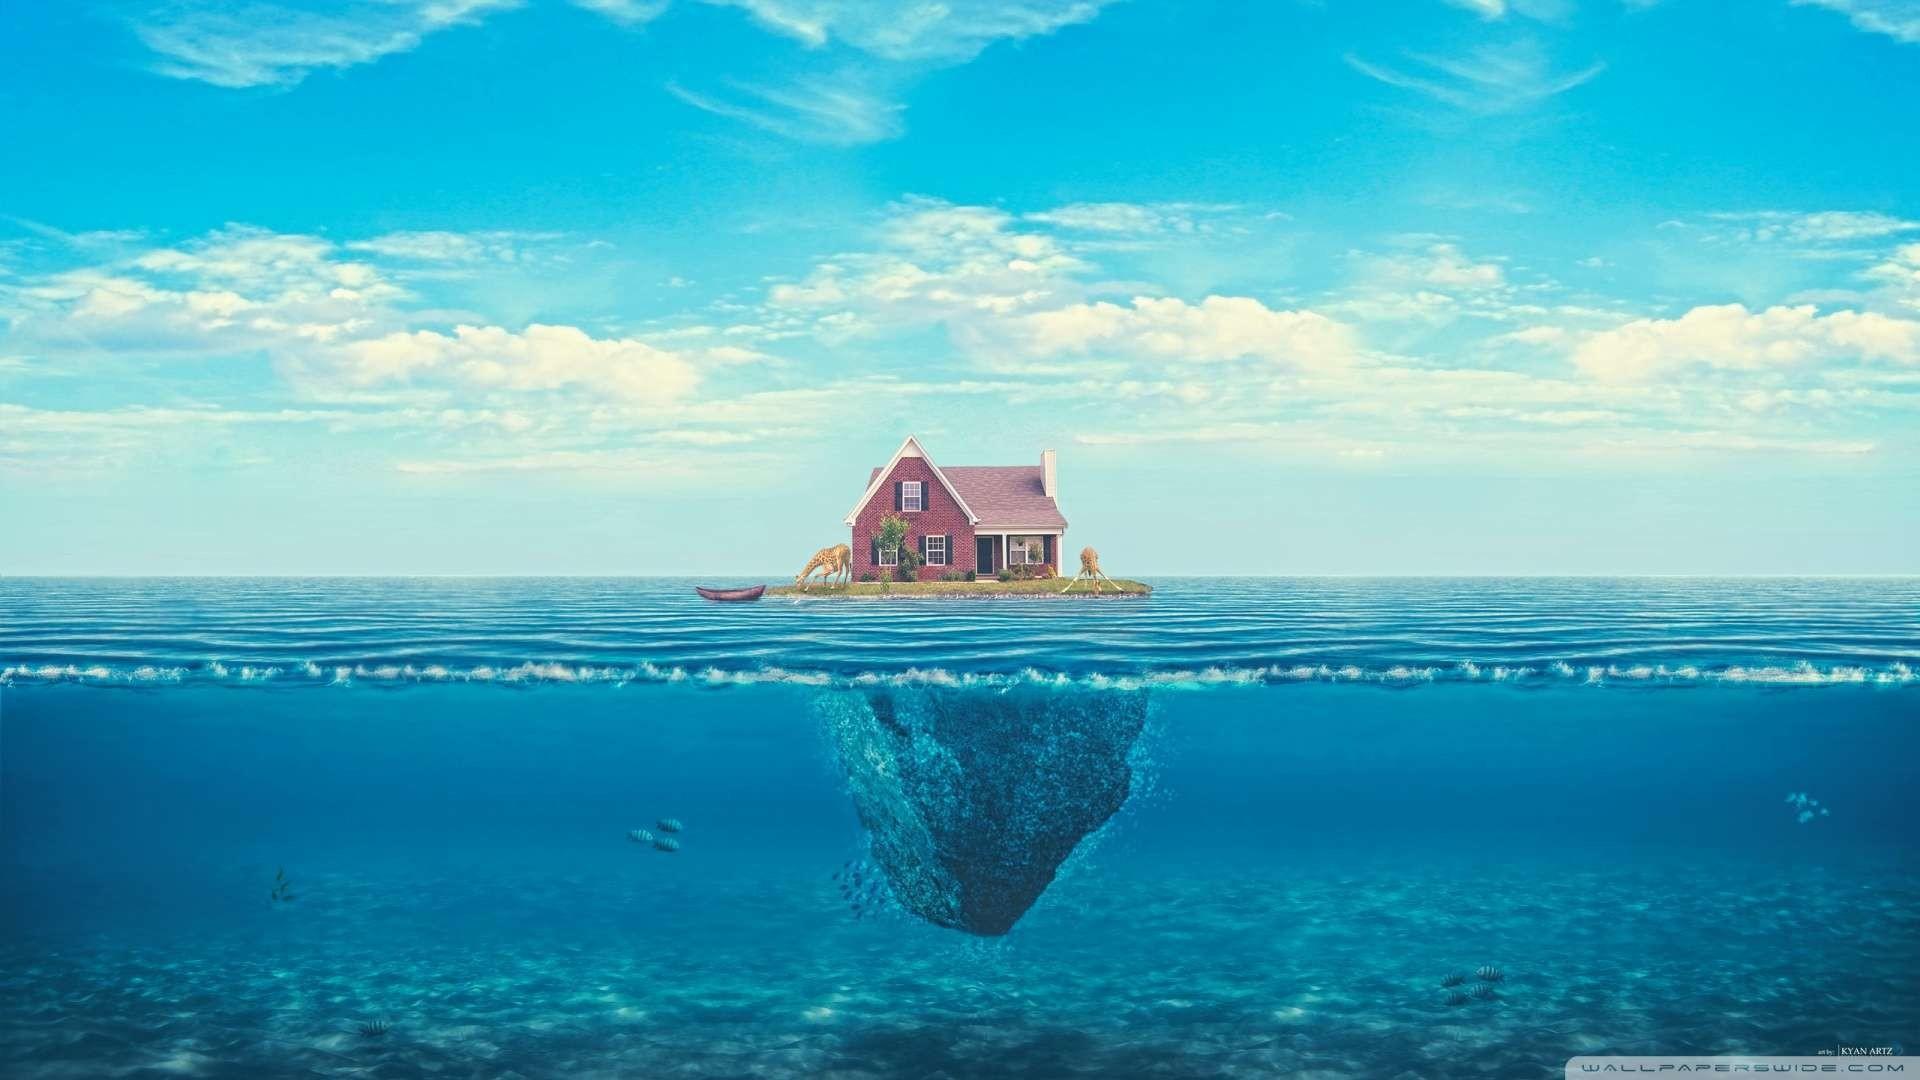 1080p wallpaper ocean 68 images for Wallpaper hd 1080p home